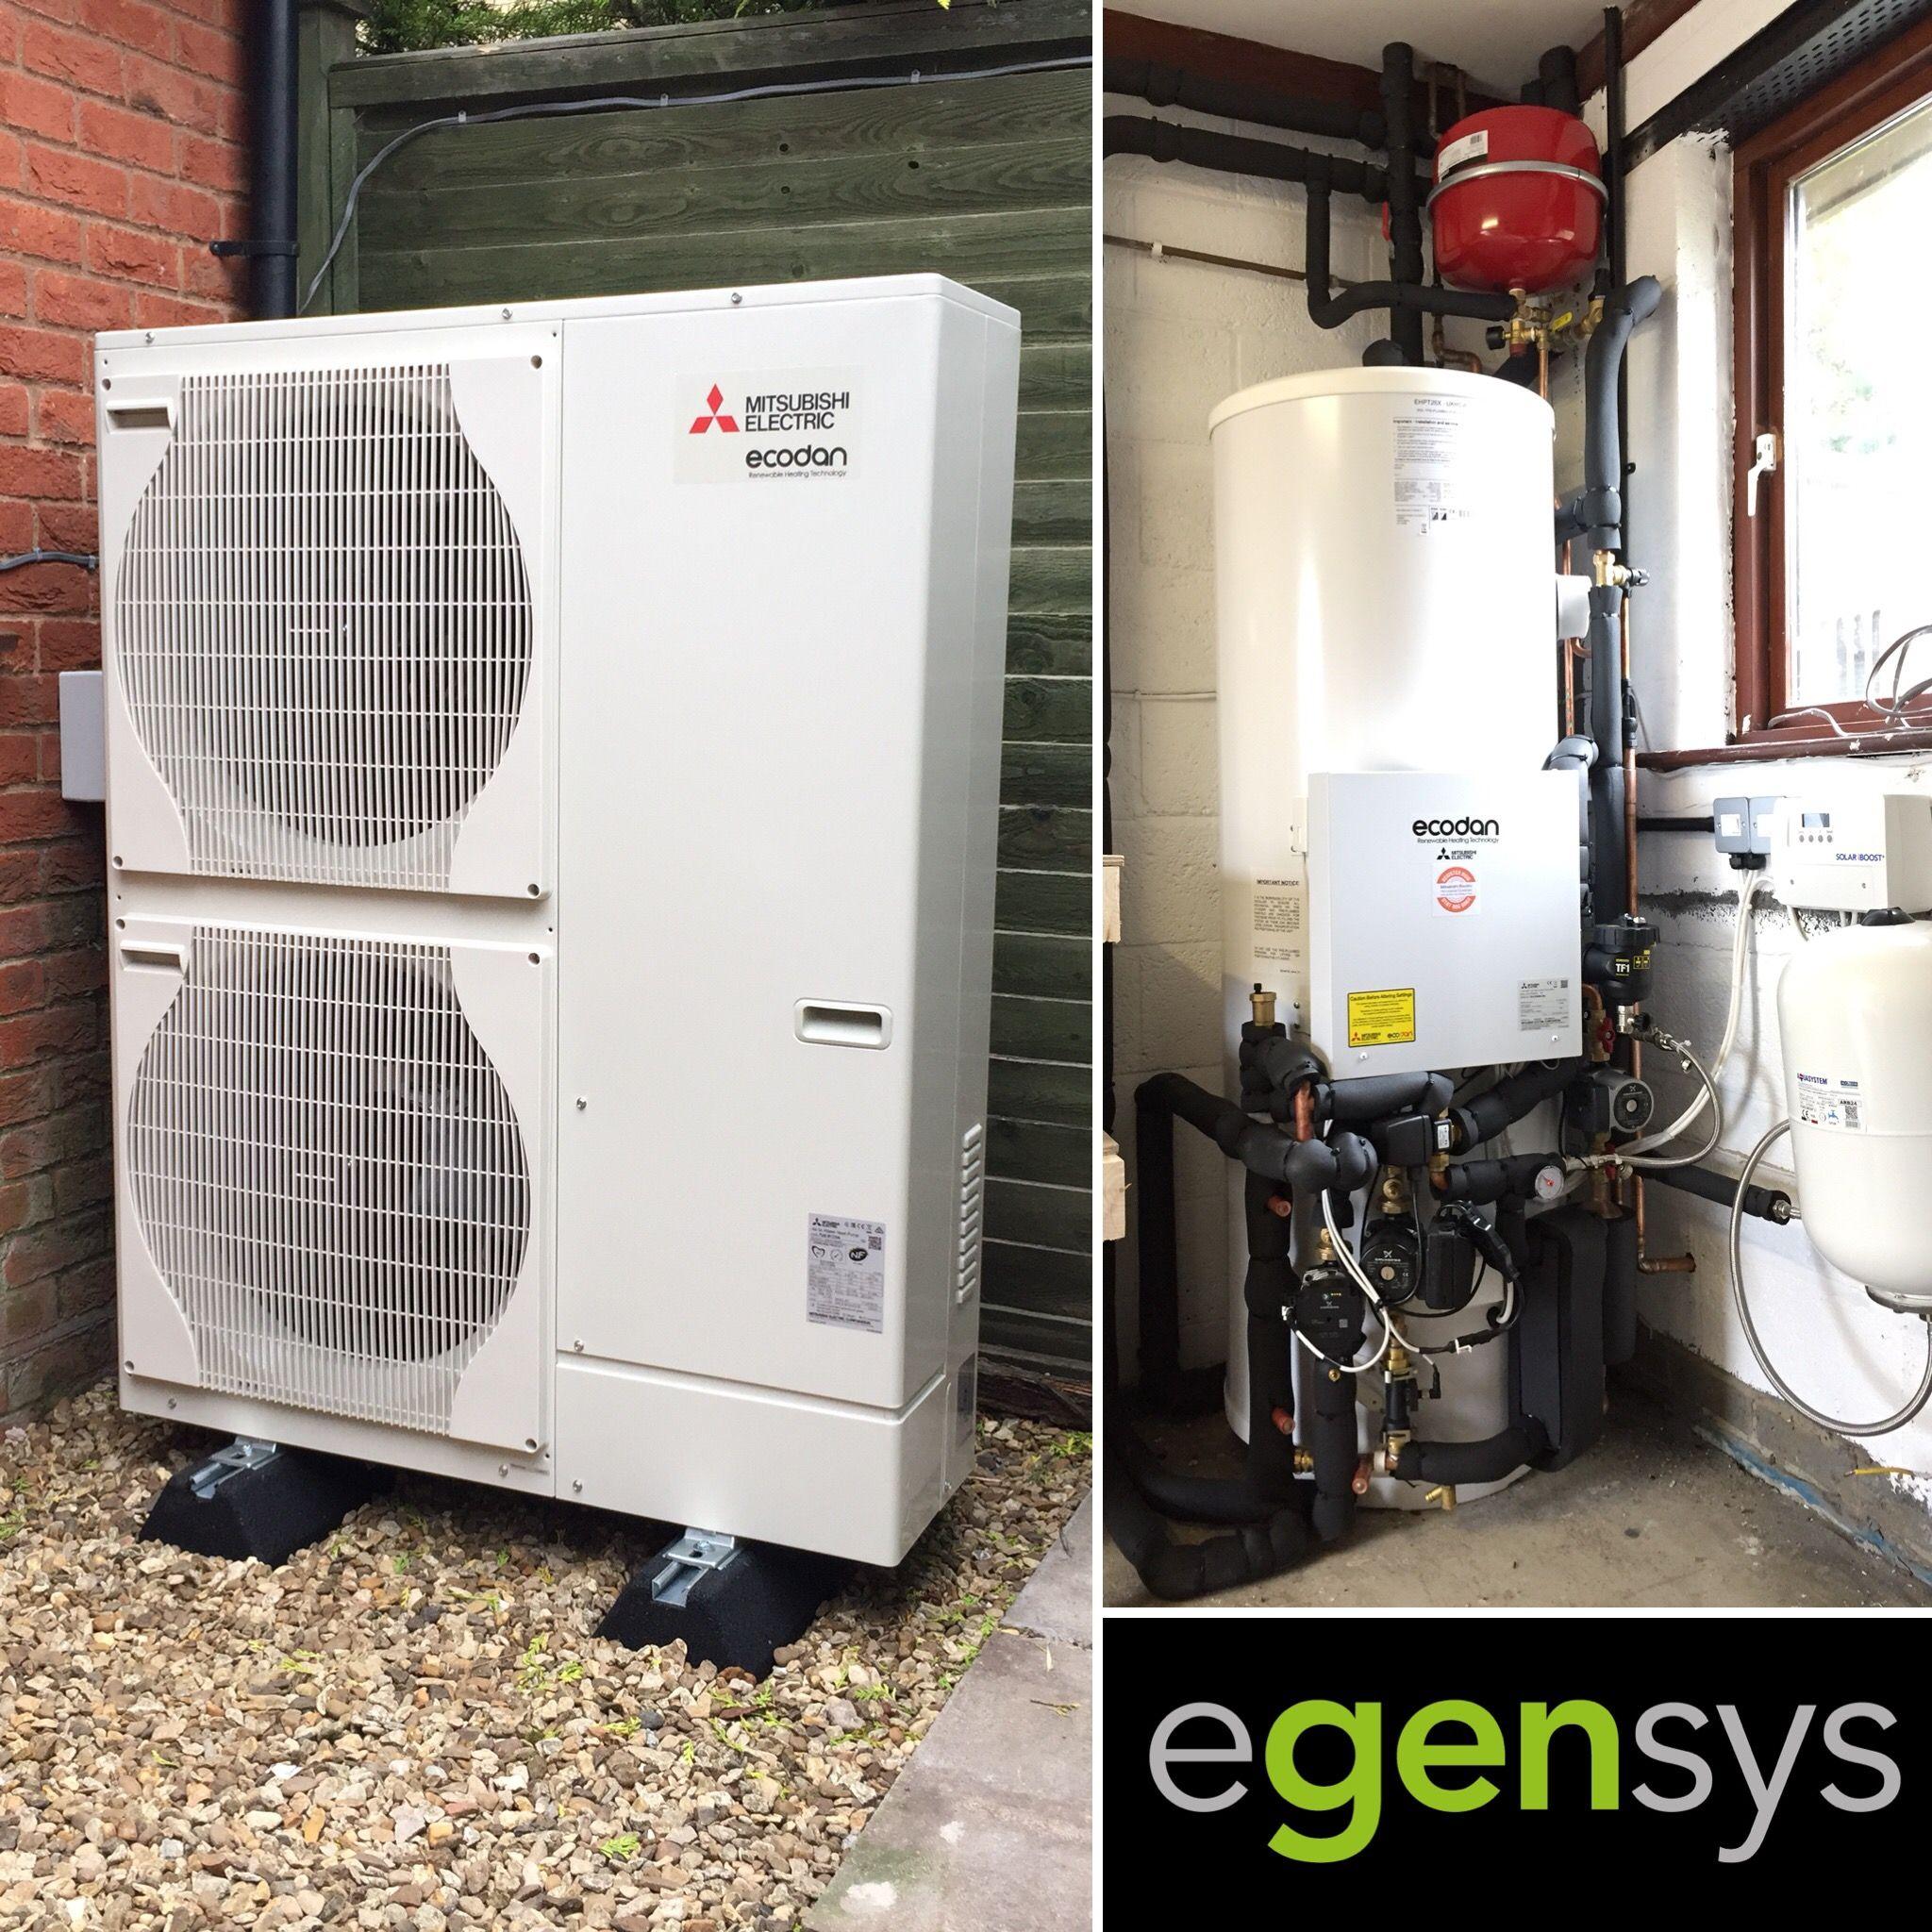 11.2kW Ecodan Air Source Heat Pump (PUHZ‑W112VHA) with